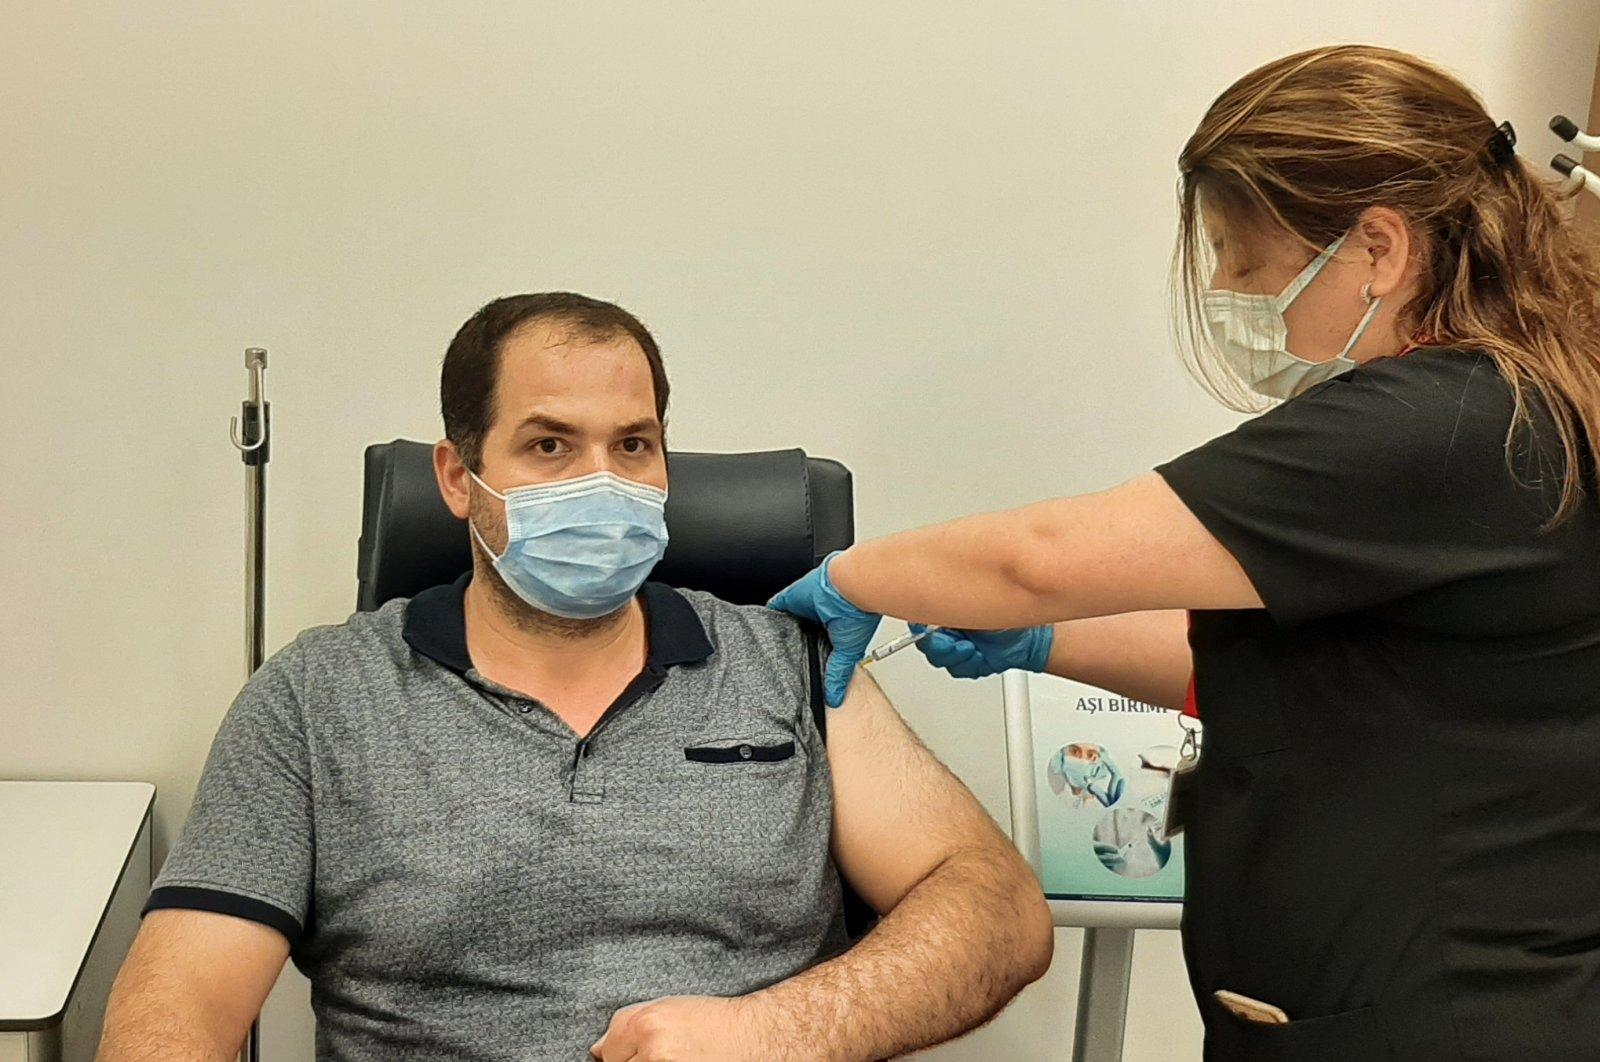 Hüseyin Polat, a volunteer, gets vaccinated with Turkovac, in the capital Ankara, Turkey, June 24, 2021. (AA PHOTO)